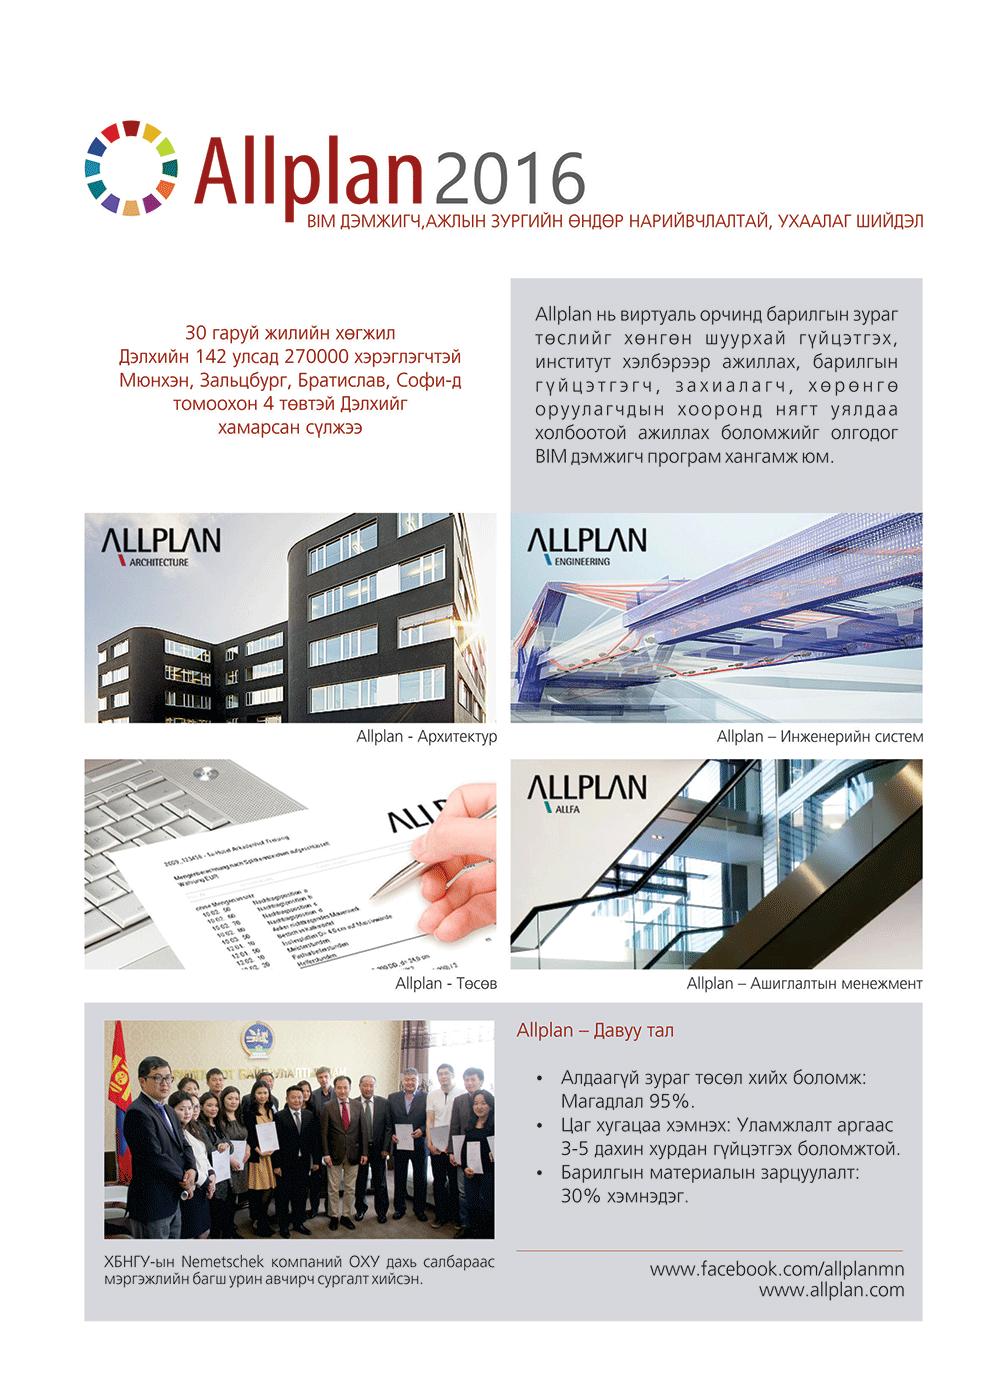 Allplan 2016